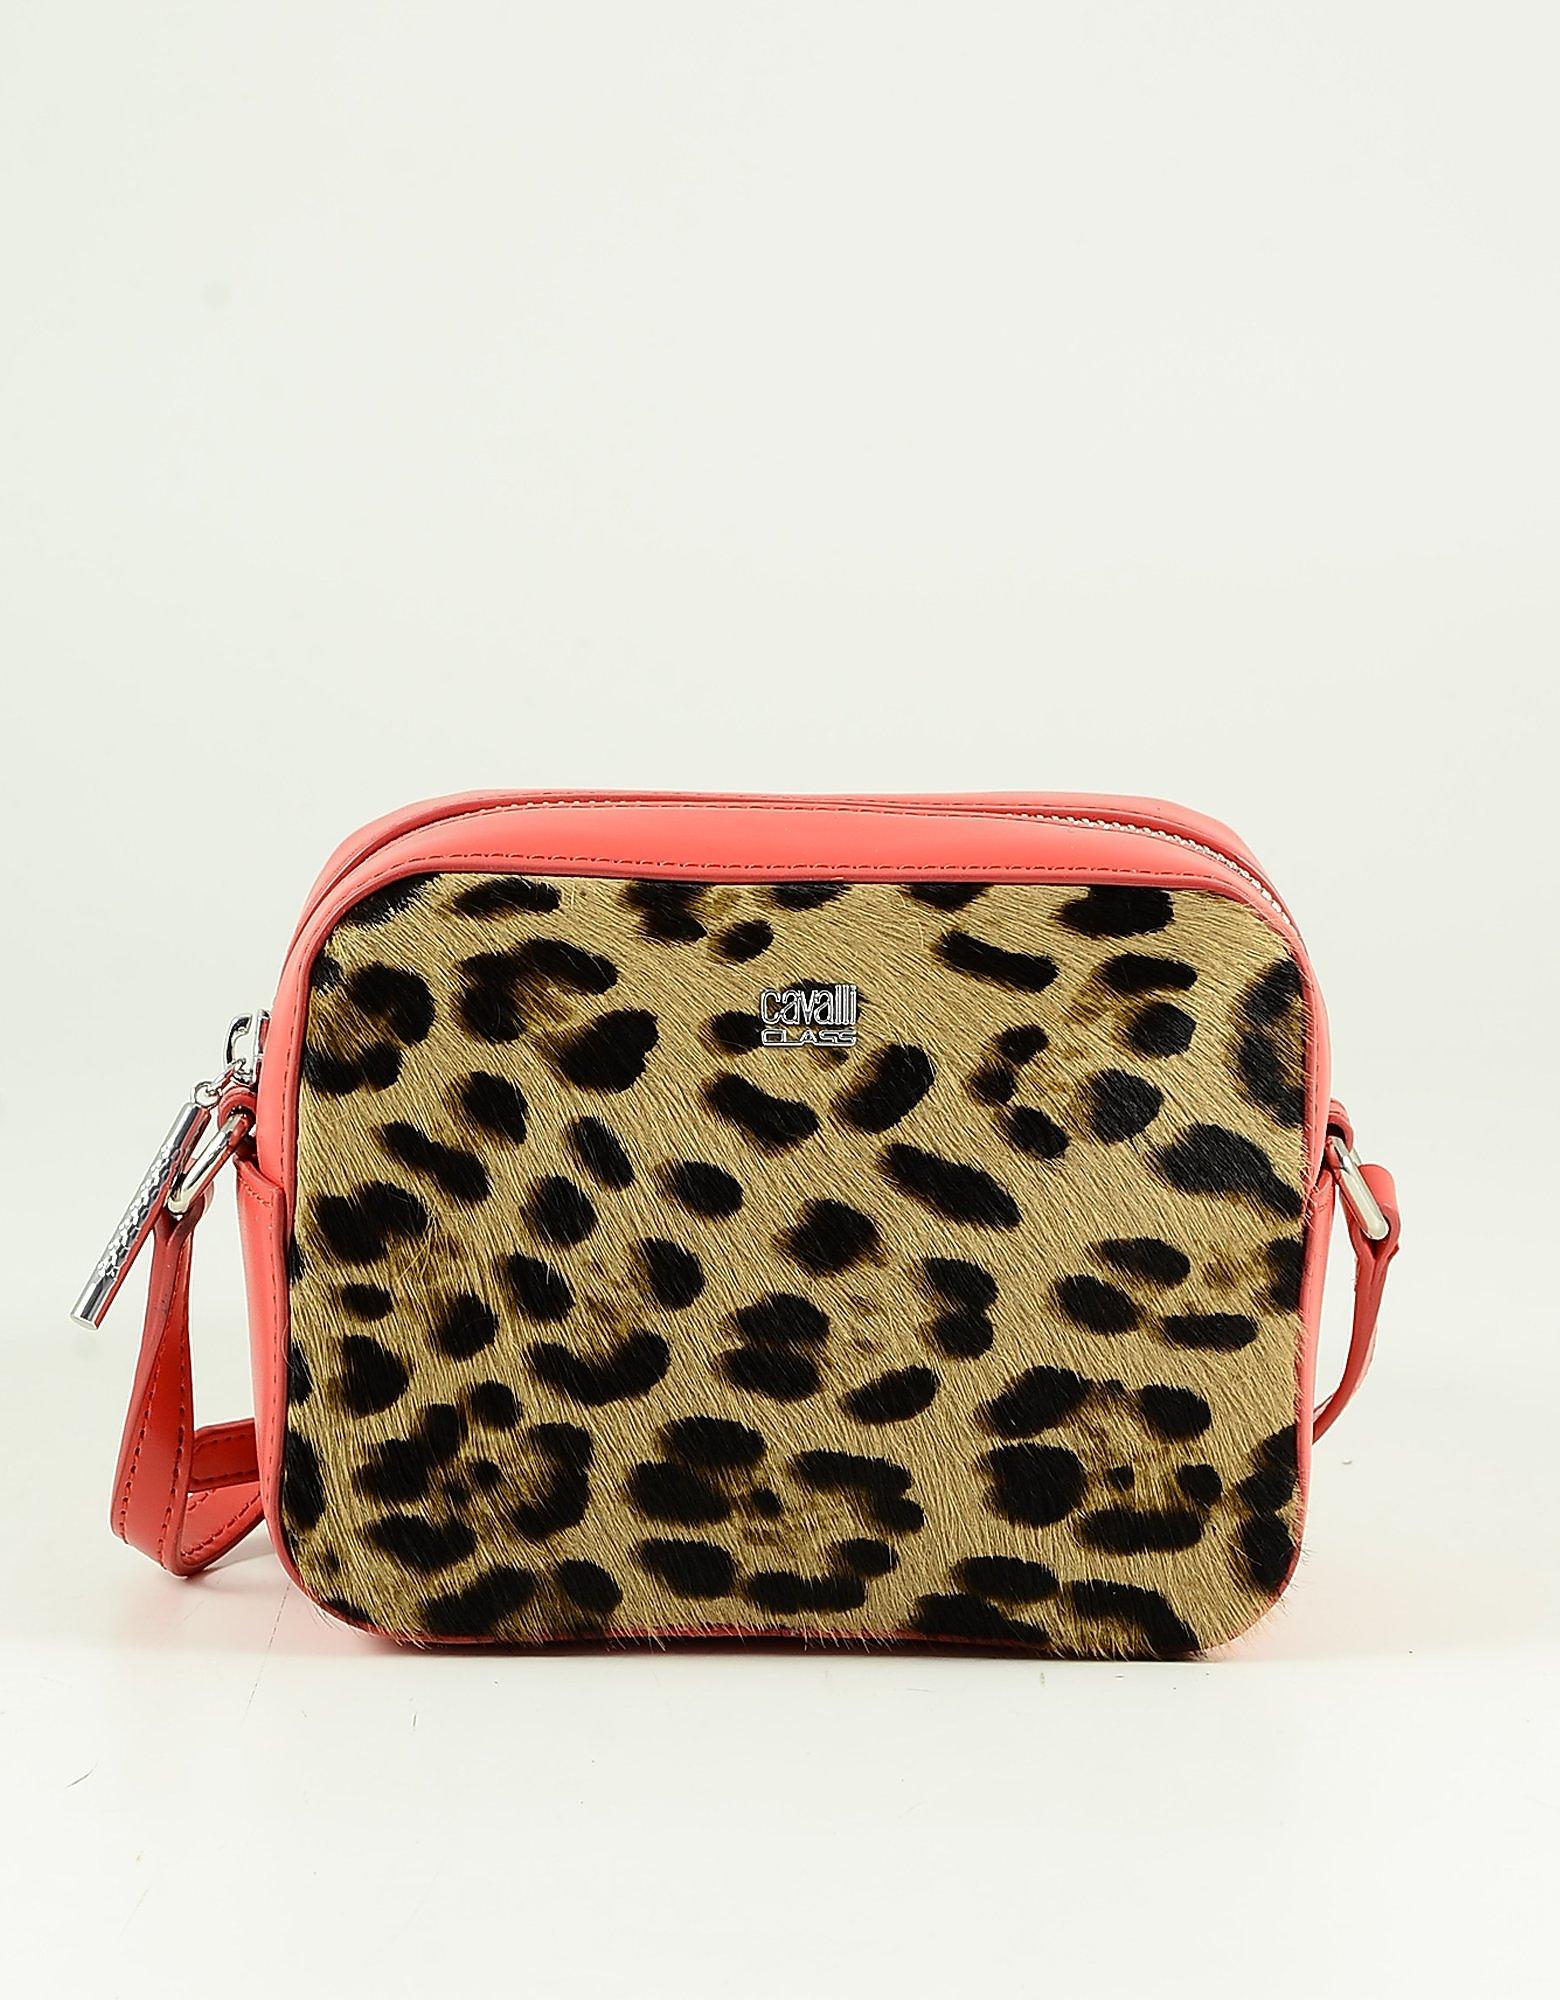 Class Roberto Cavalli Brown Animal Print Hair-calf Leather Camera Bag